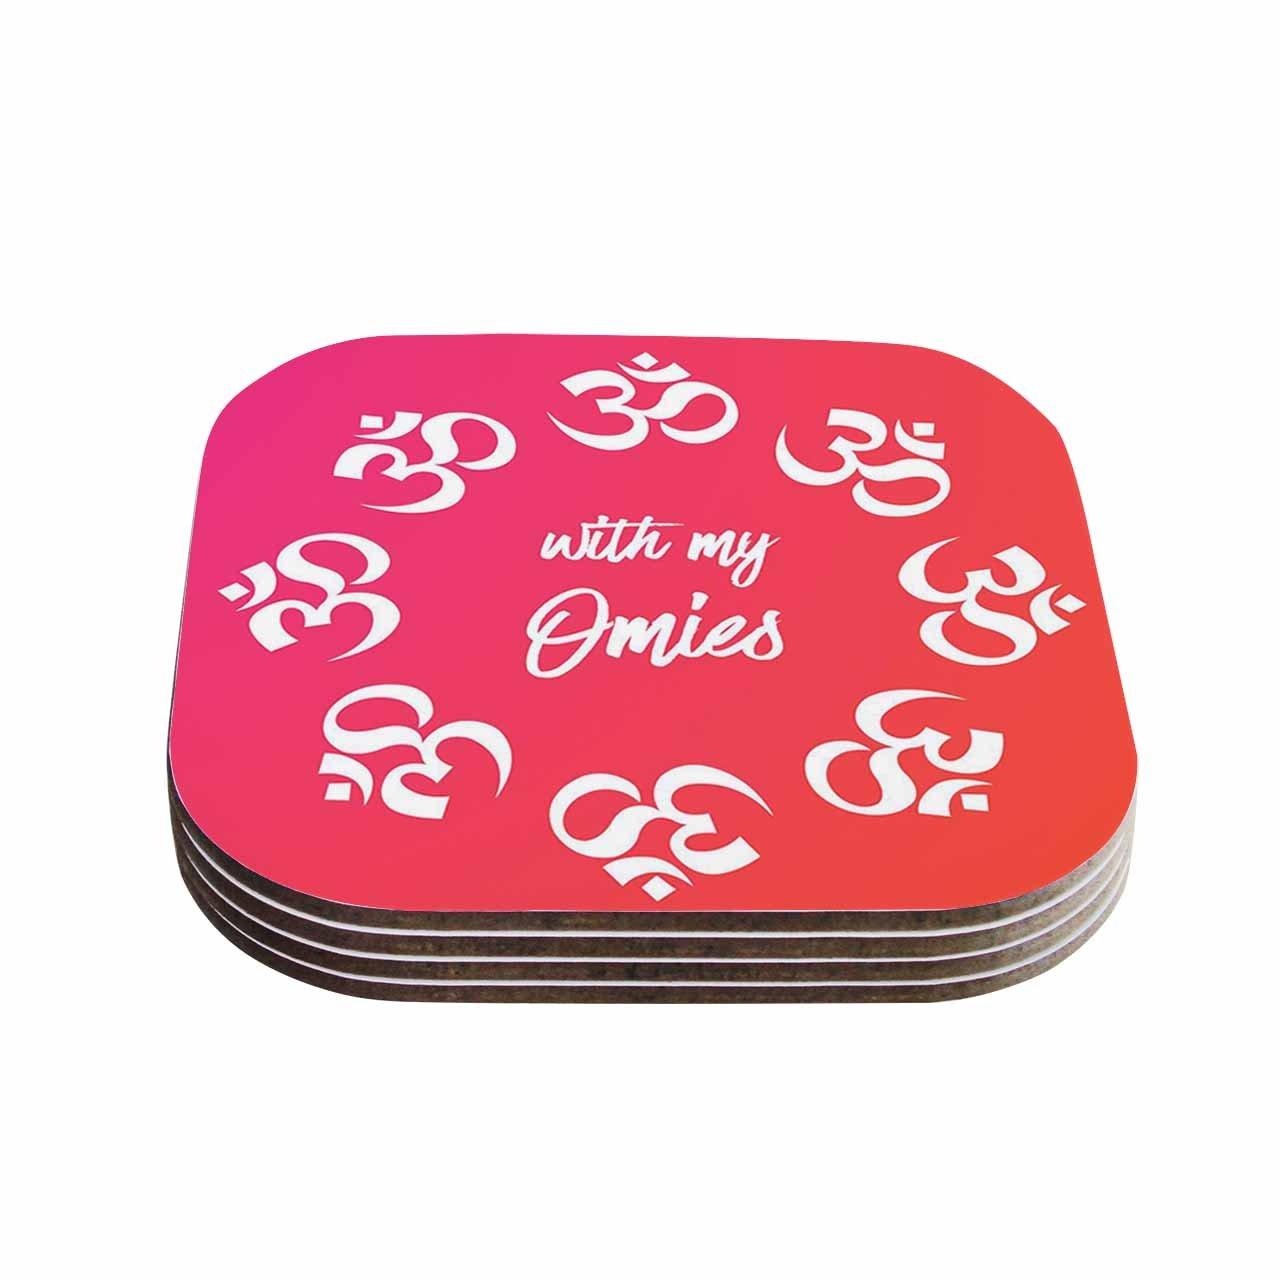 KESS InHouse OriginalWith My Omies Pink Coral Magenta Coasters 4 x 4 Multicolor Set of 4